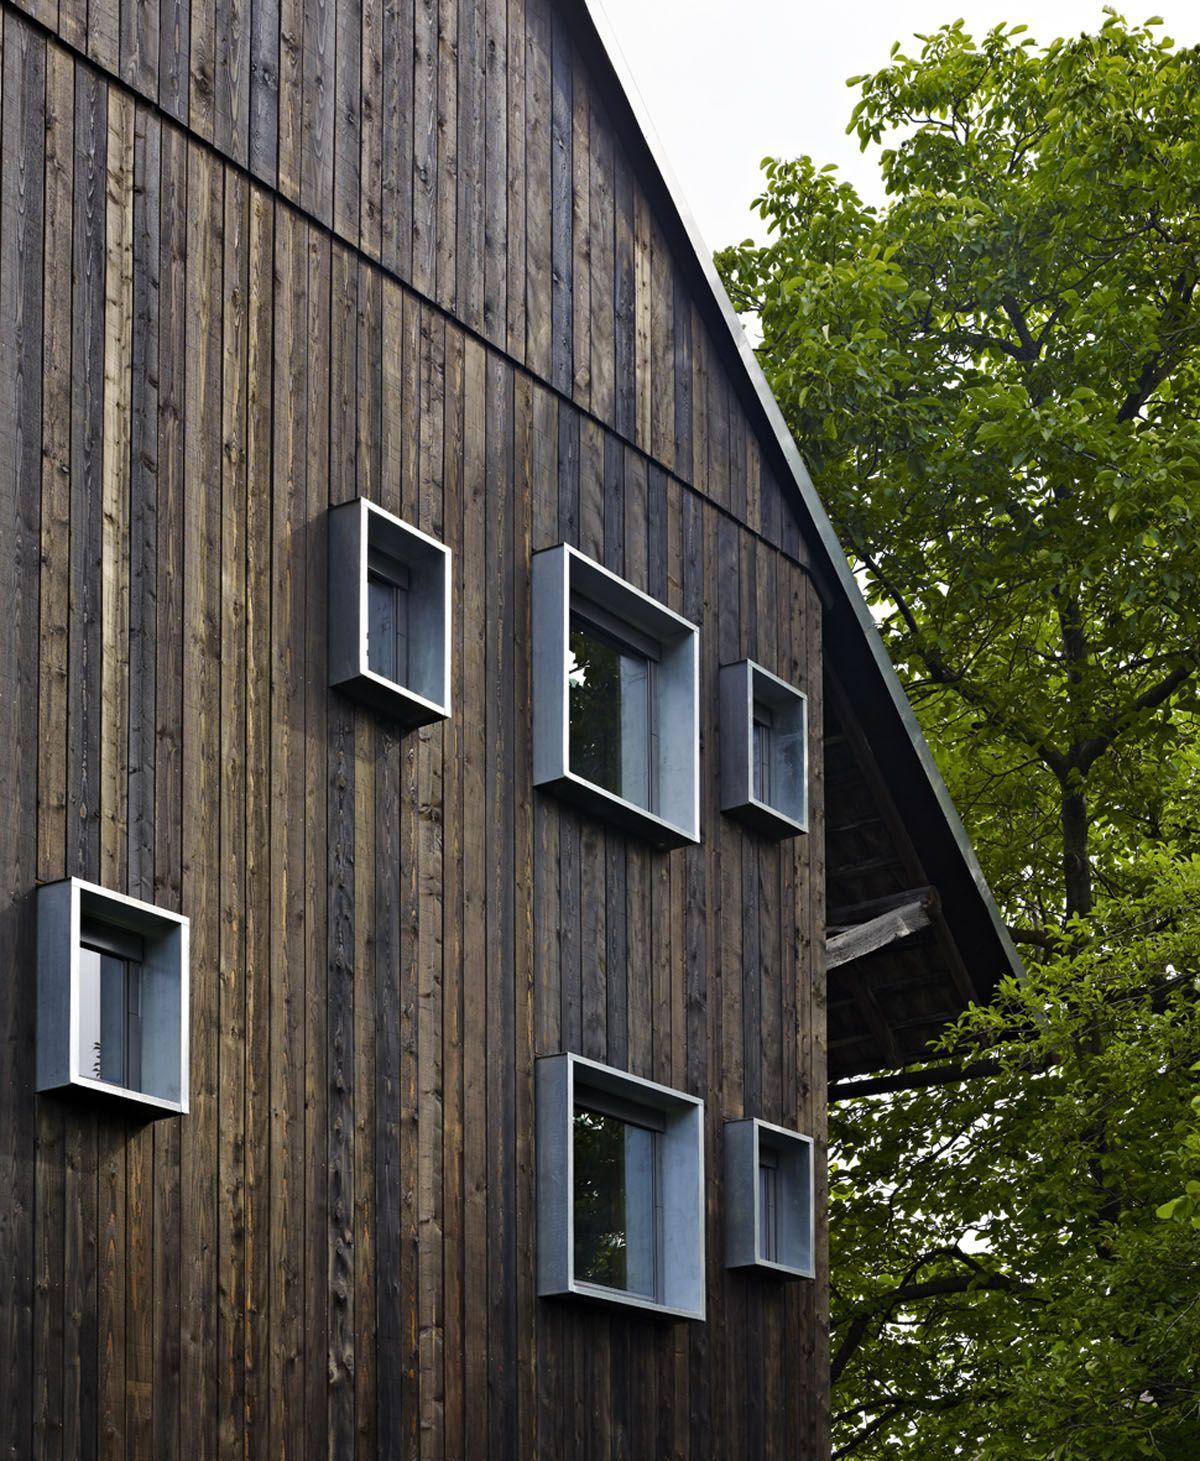 atelier d 39 architecture loic picquet altkirch fr h user houses wohnhaus innenarchitektur. Black Bedroom Furniture Sets. Home Design Ideas